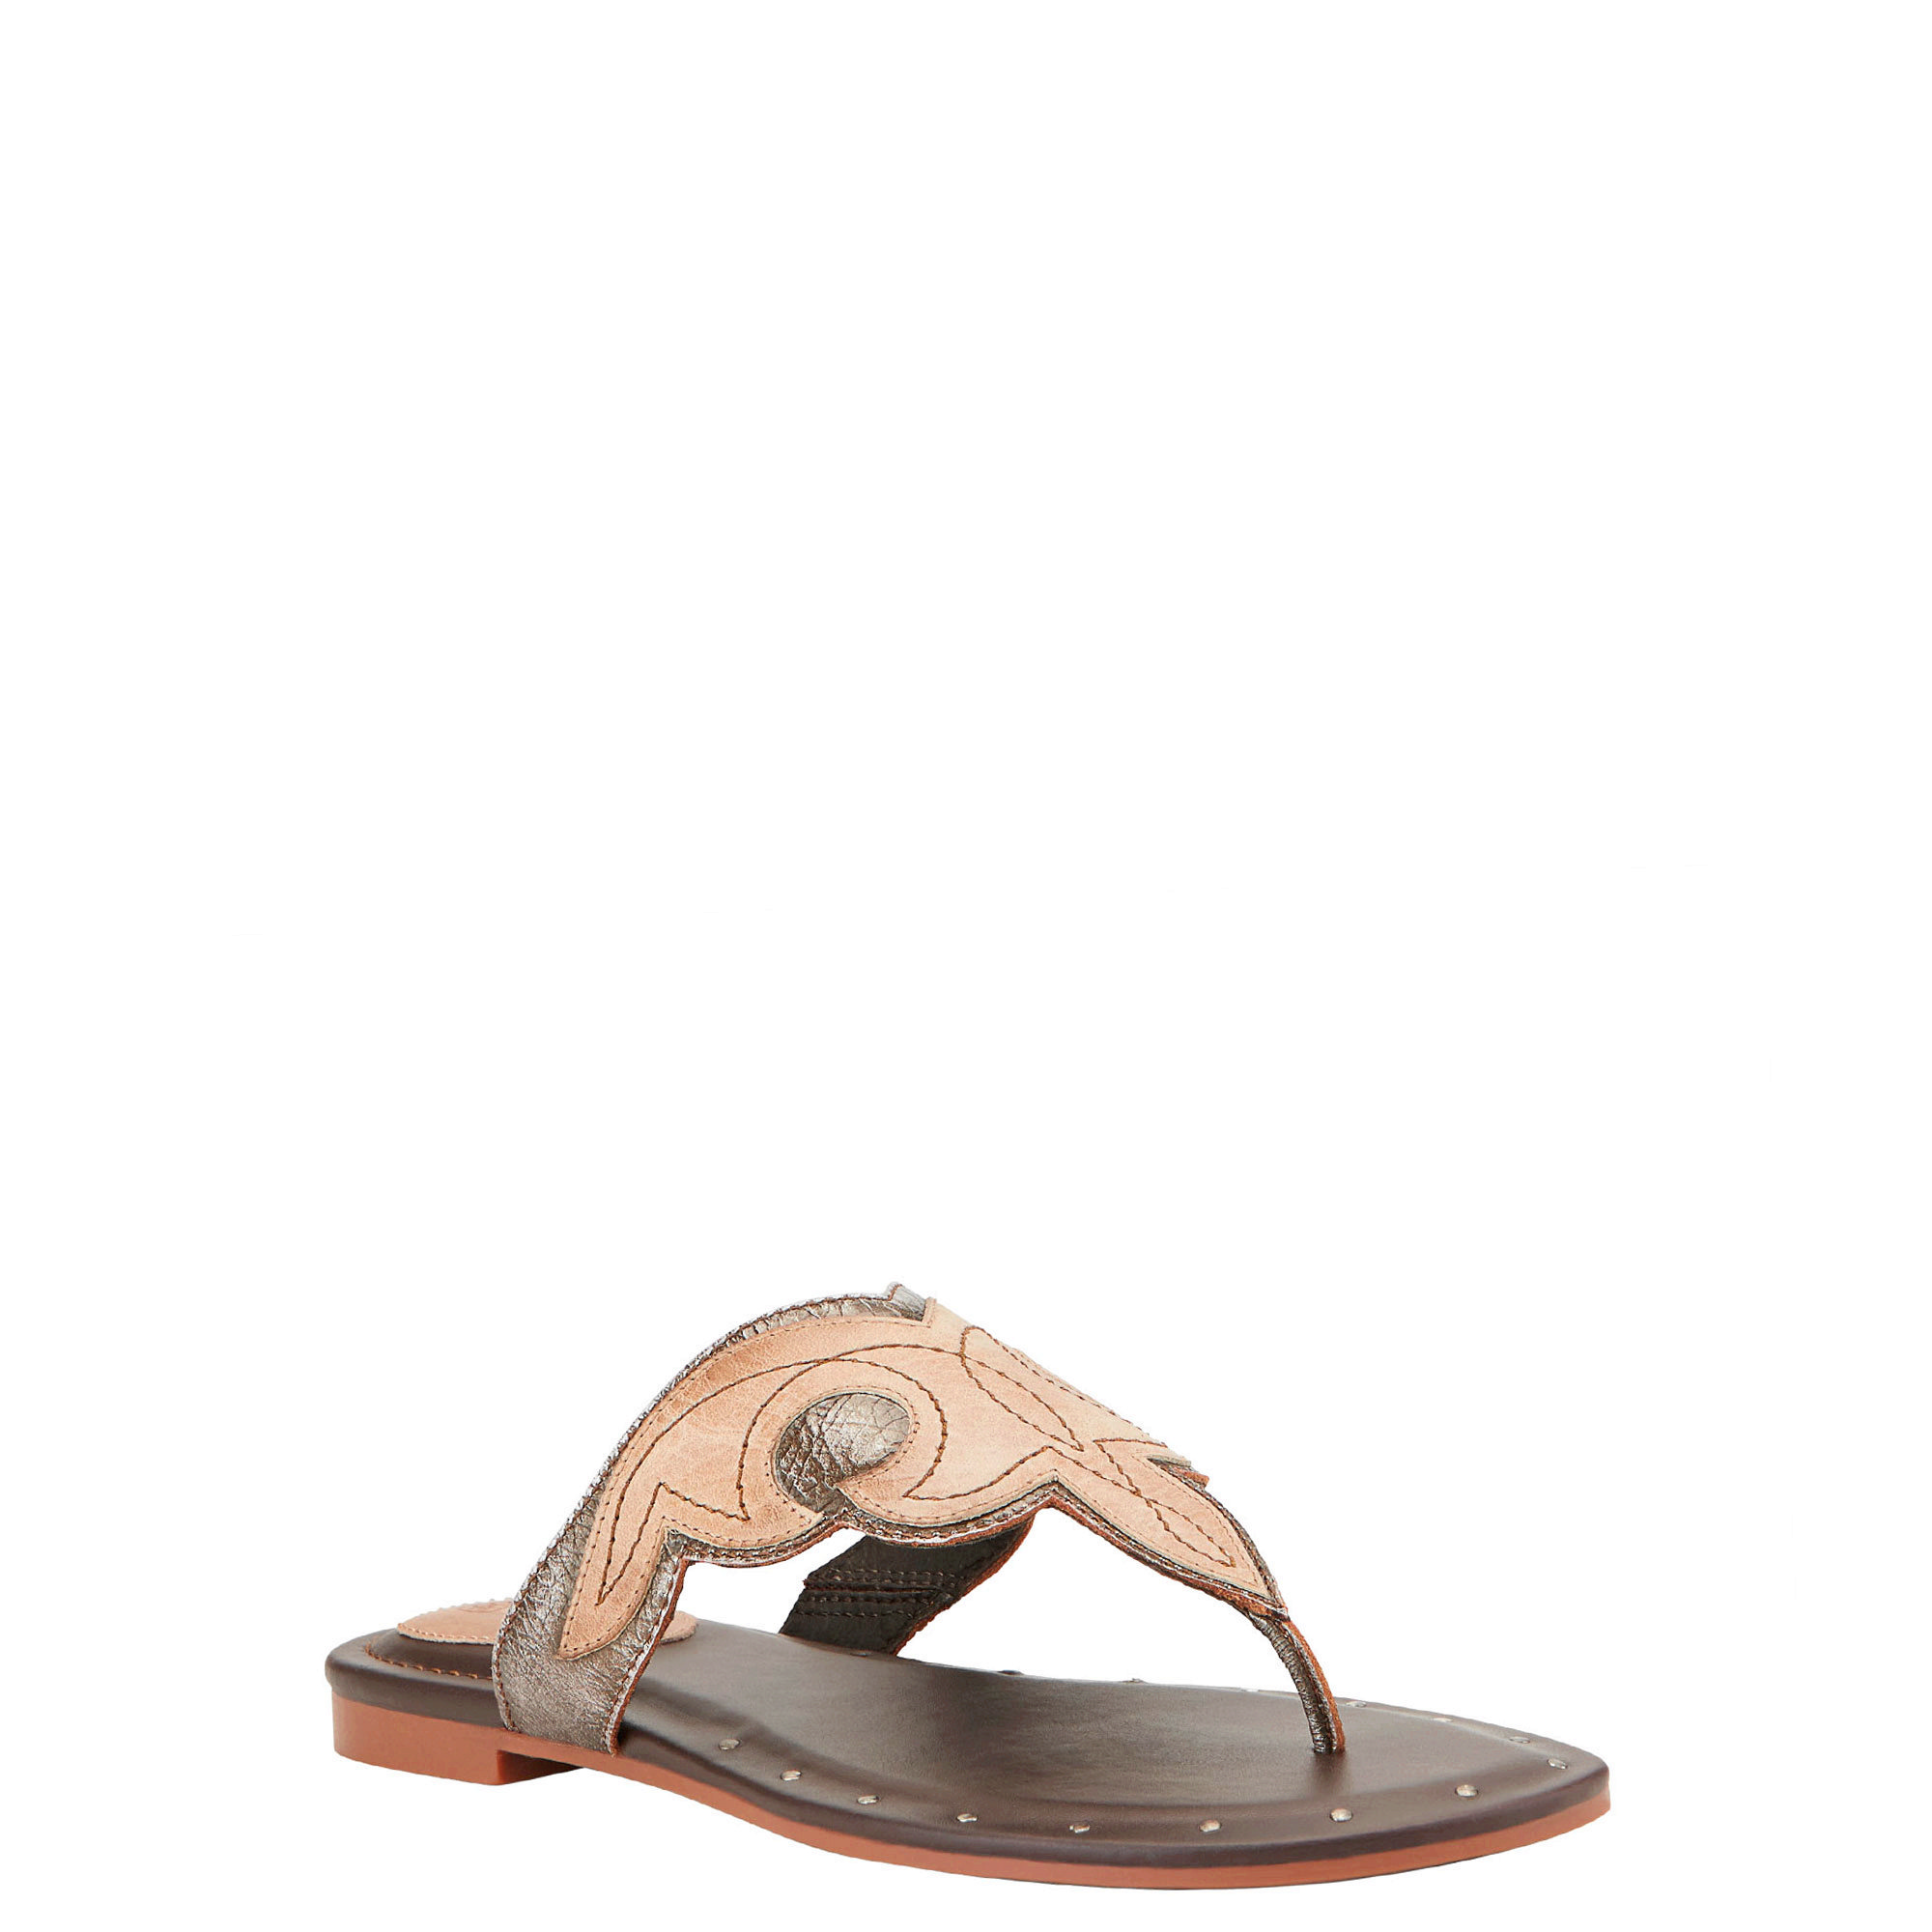 Ariat Women's Mica Sandal